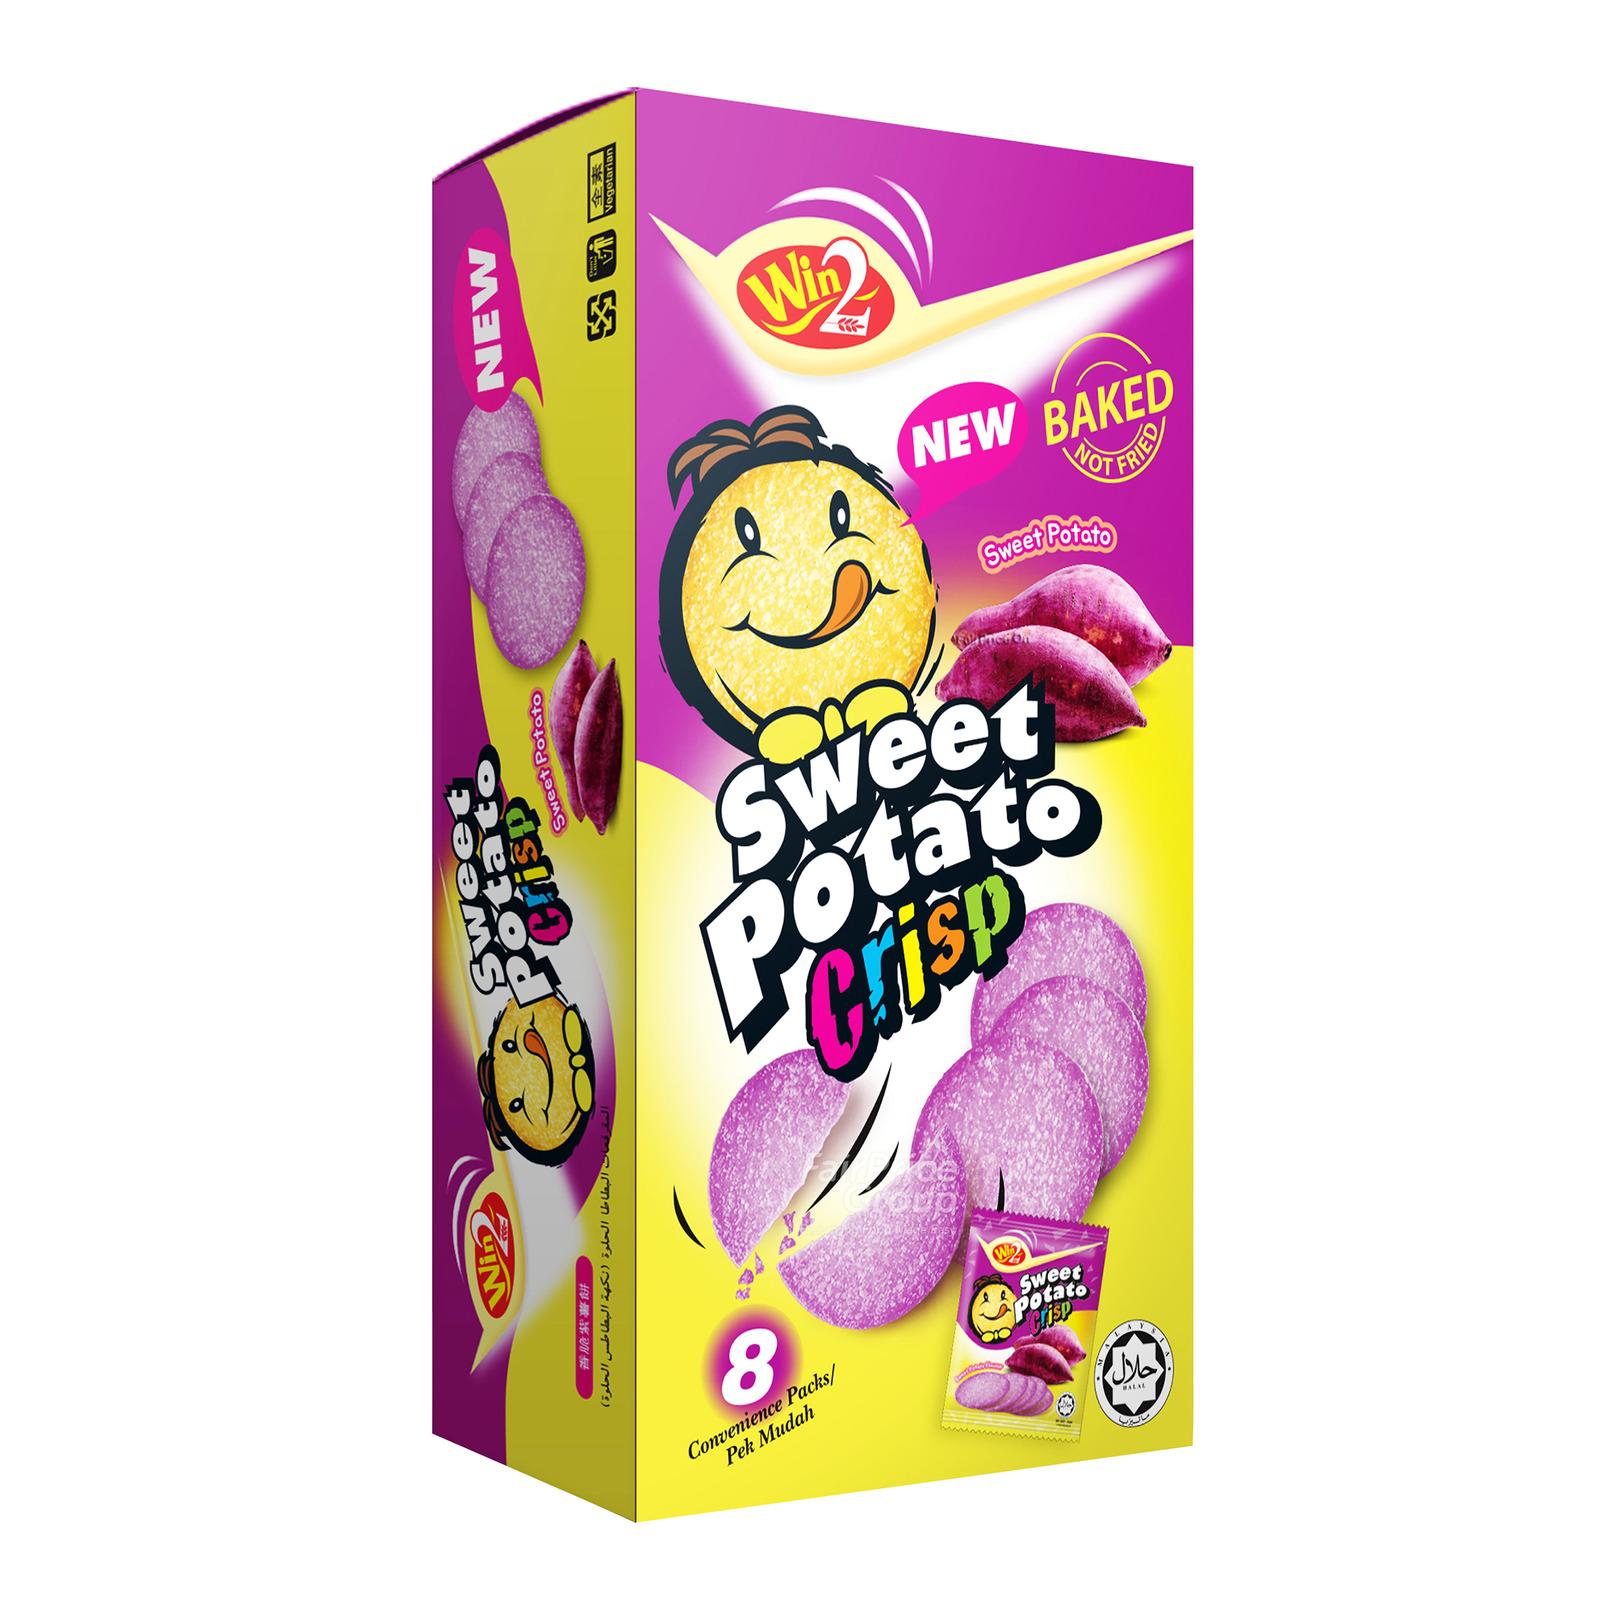 Win2 Baked Potato Crisp Crackers - Sweet Potato